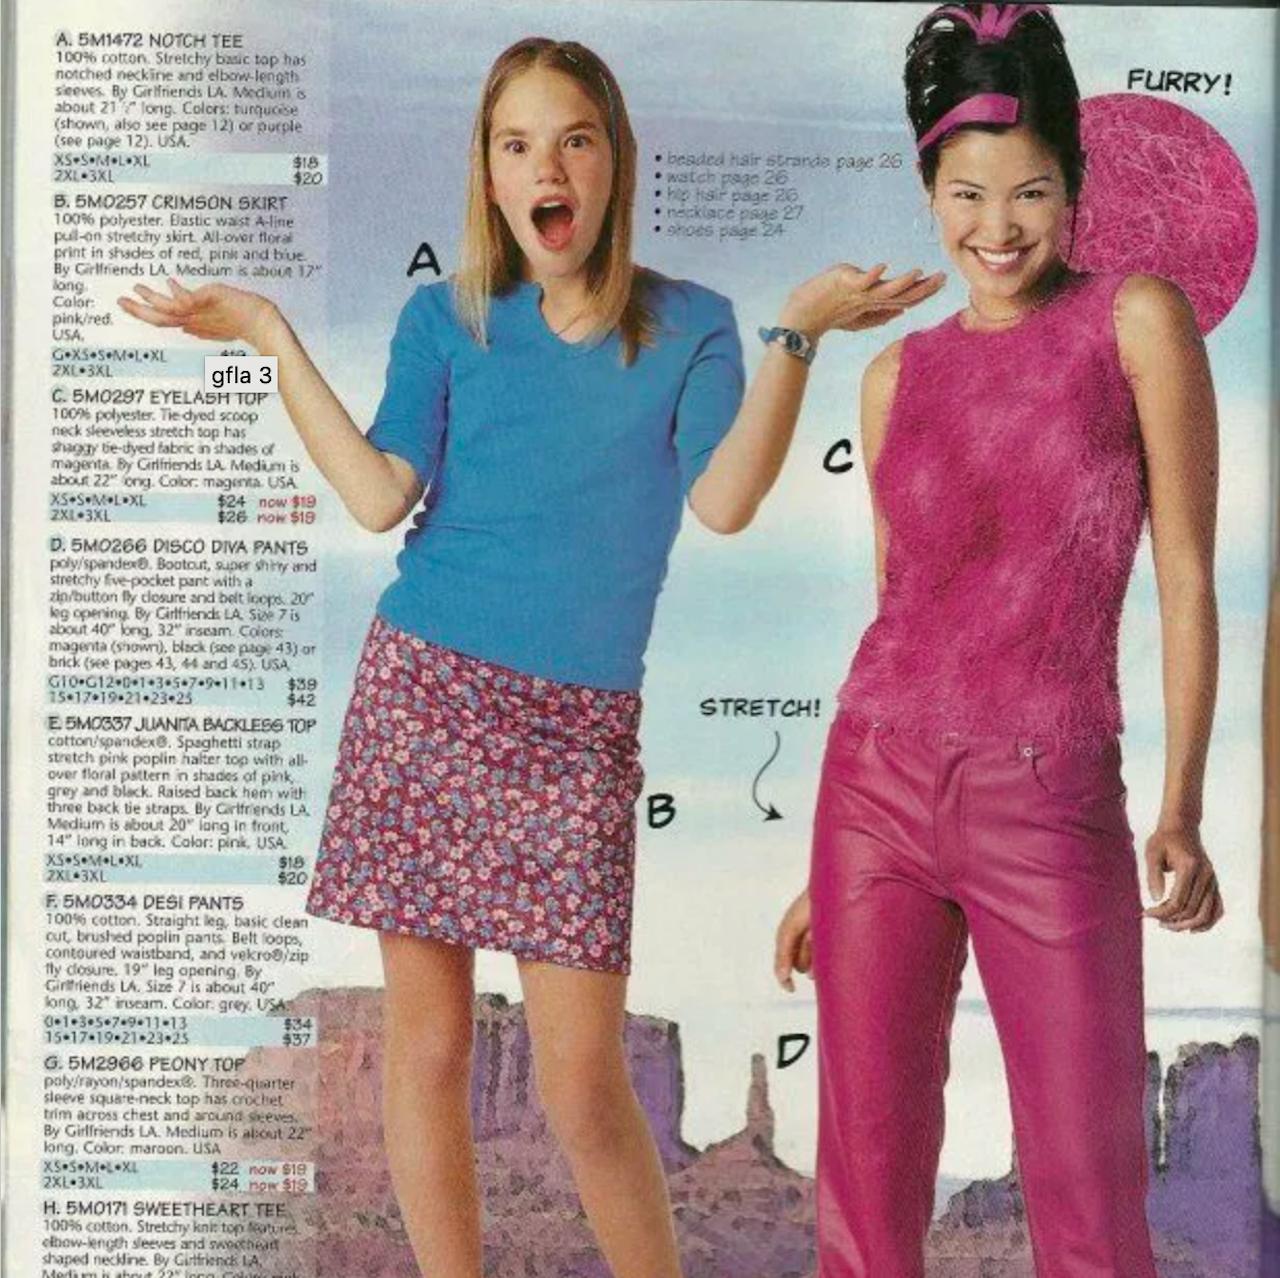 Advertisement from Girlfriends L.A. catalog.